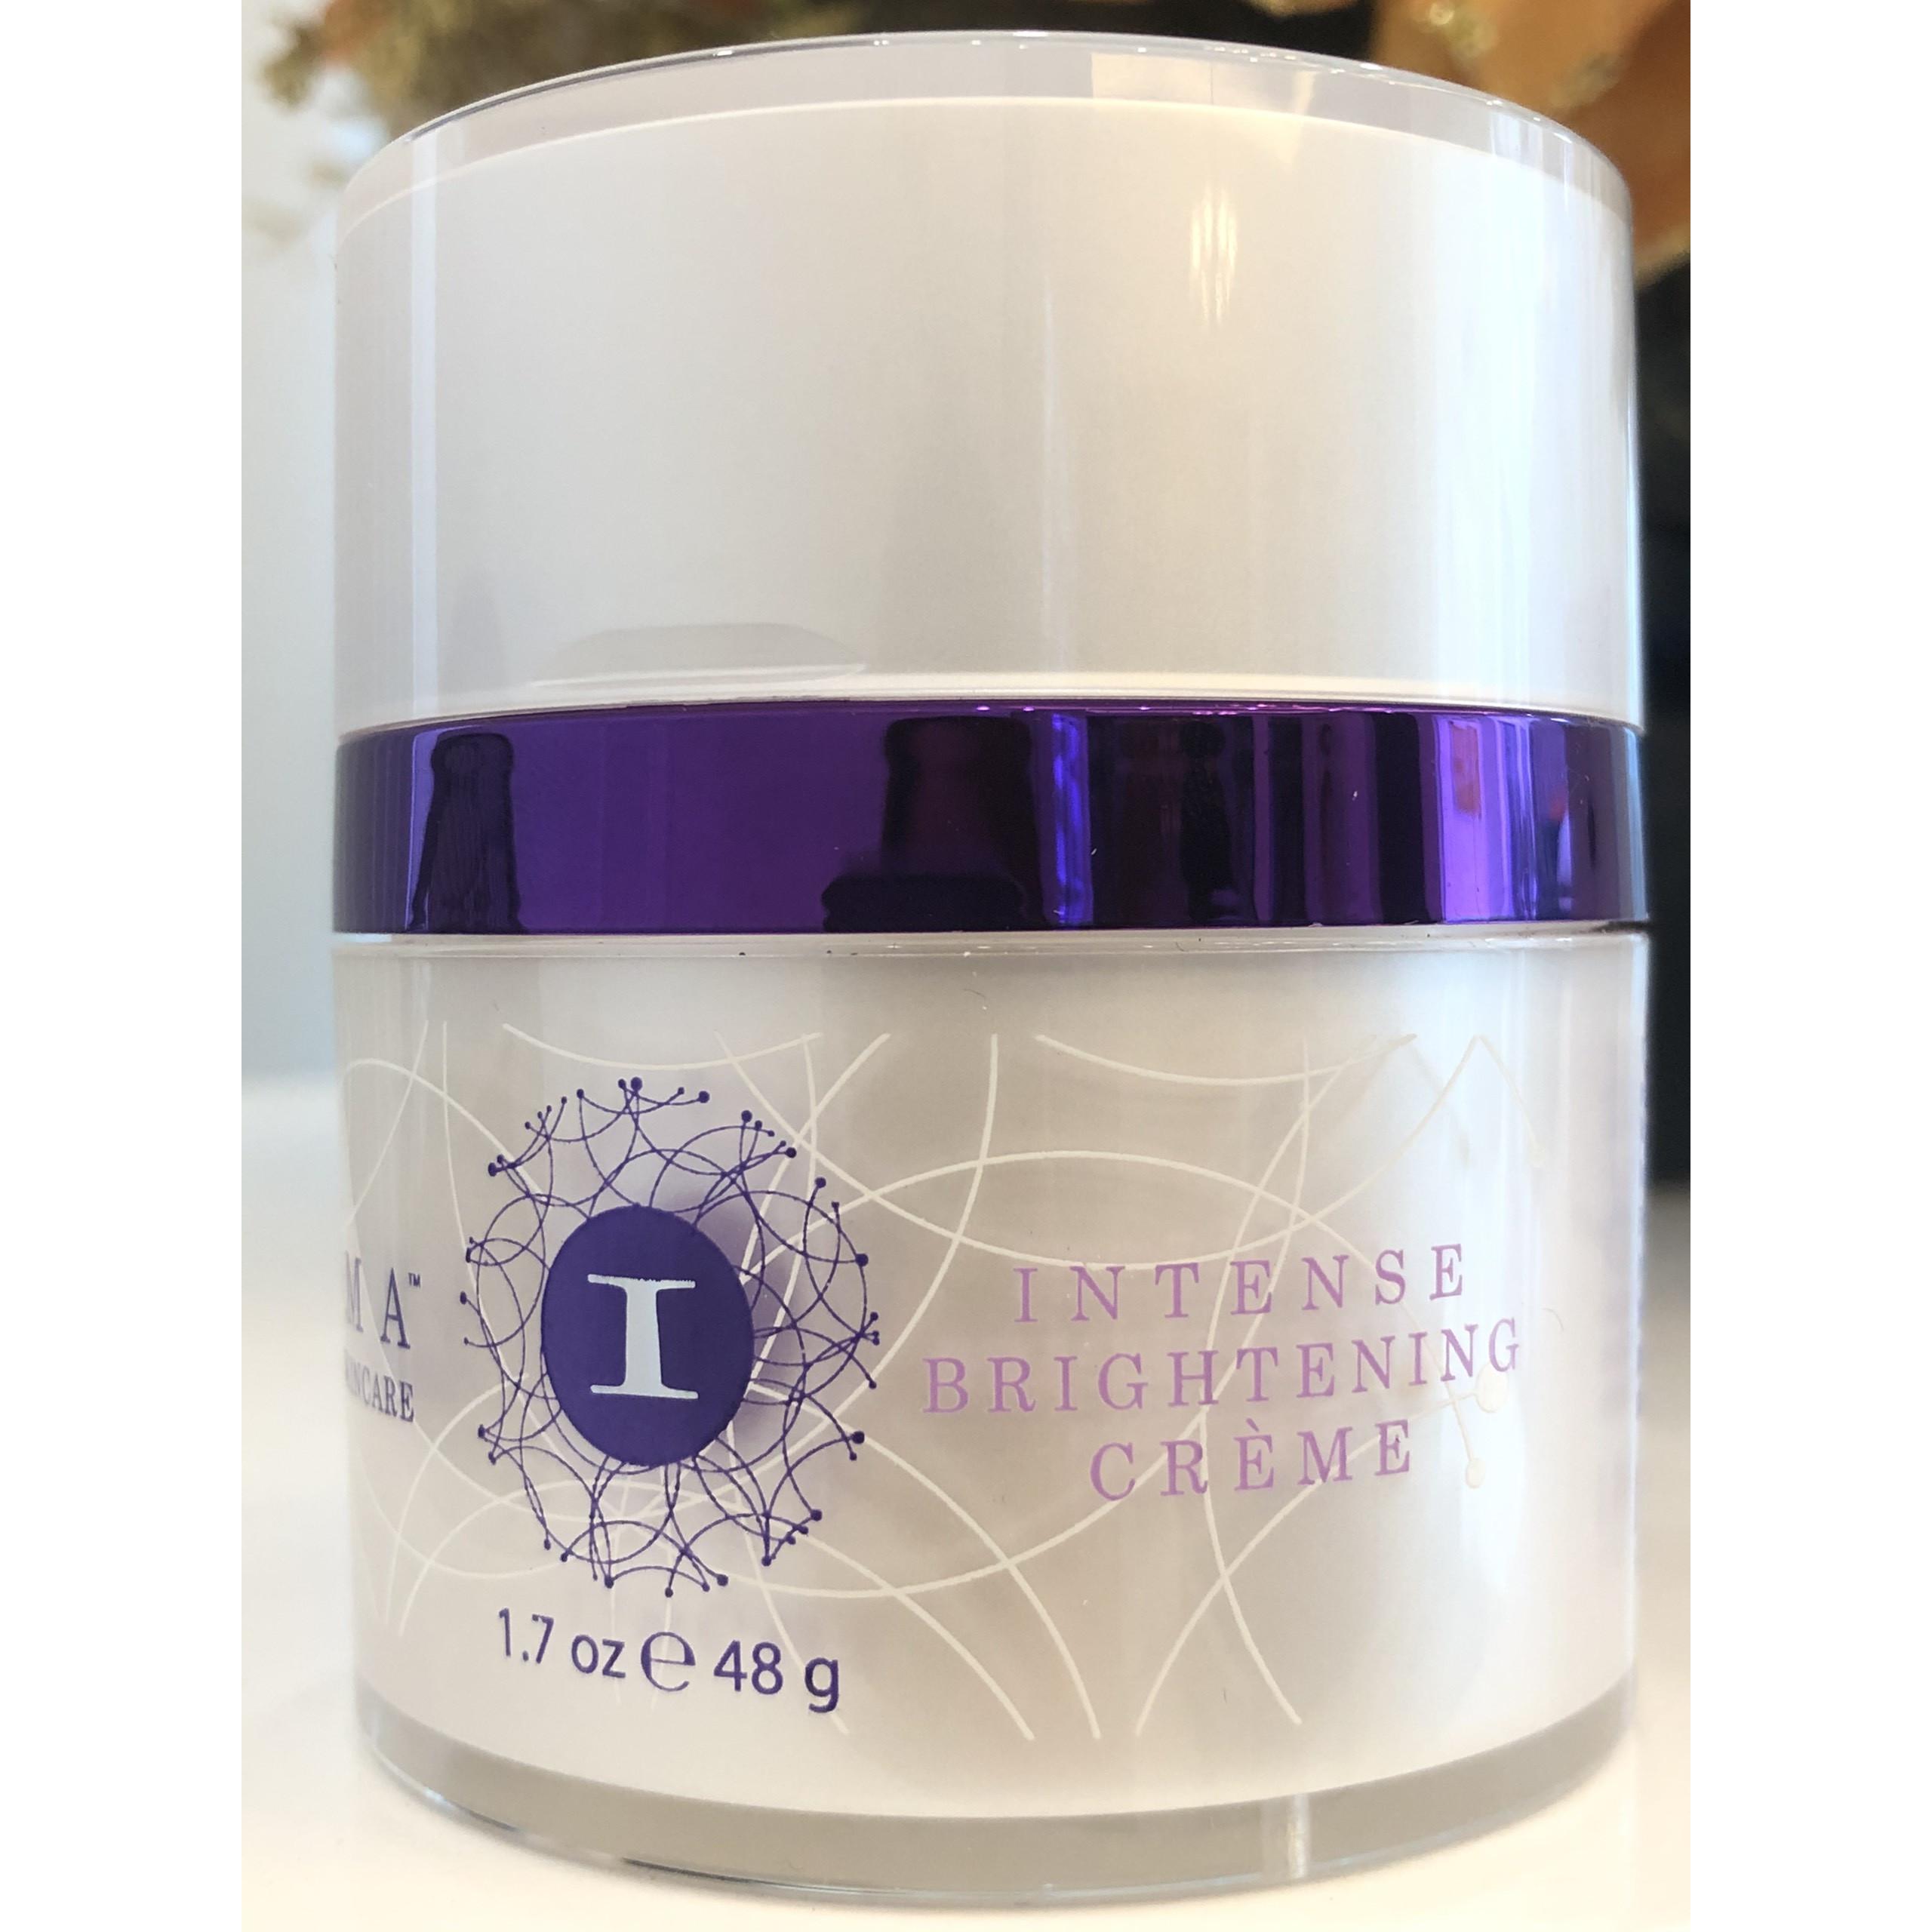 Kem Làm Trắng Da Image Skincare Iluma Intense Brightening Creme (48g)